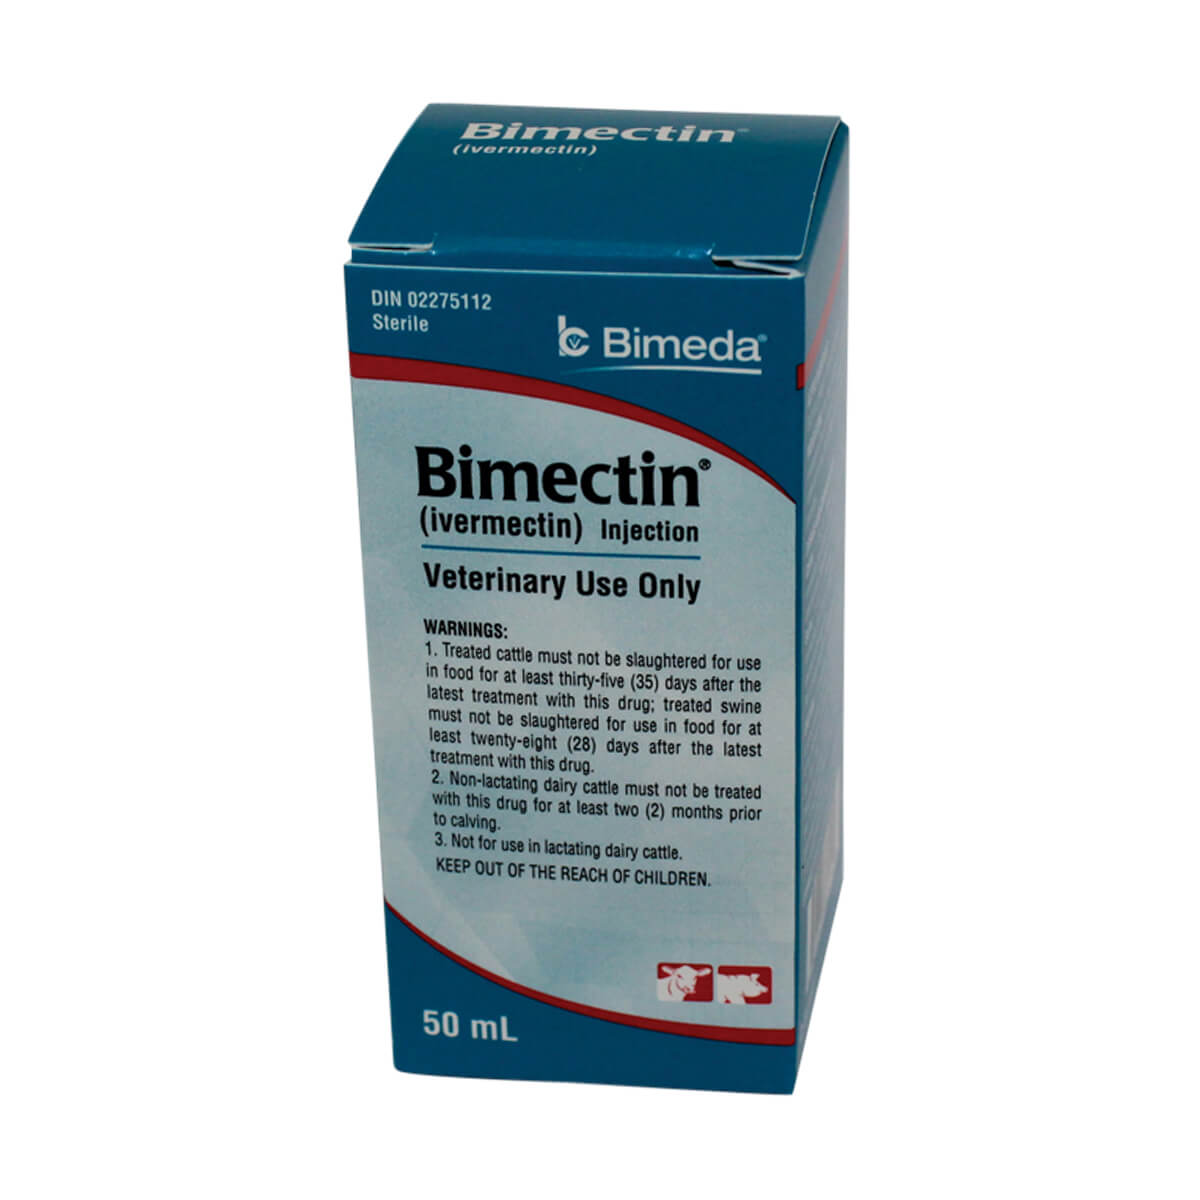 Bimectin Injectable Ivermectin - 50 ml